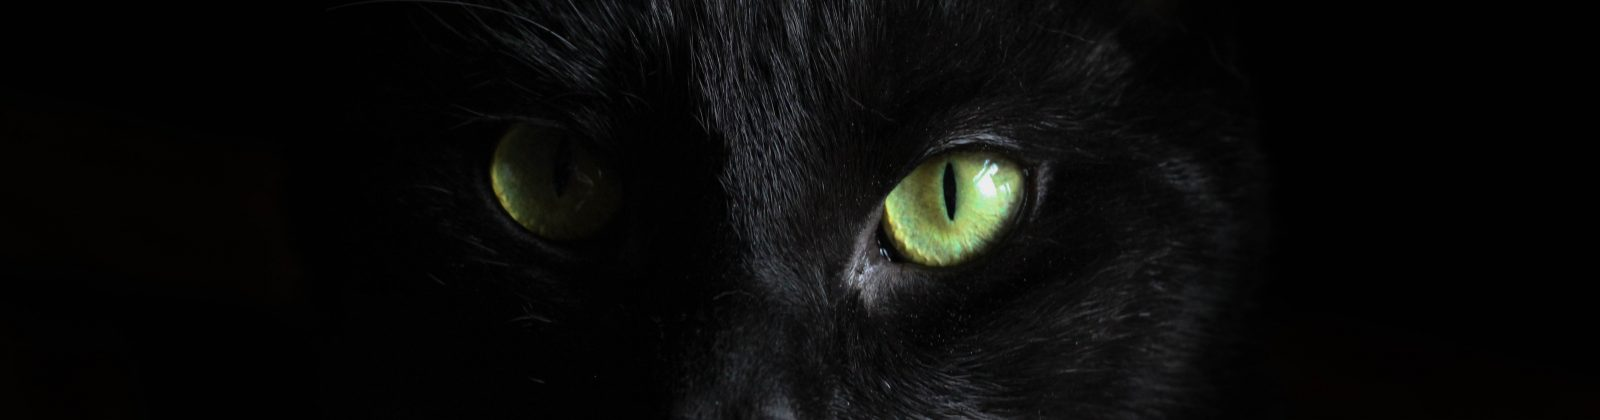 cat eyes black cat